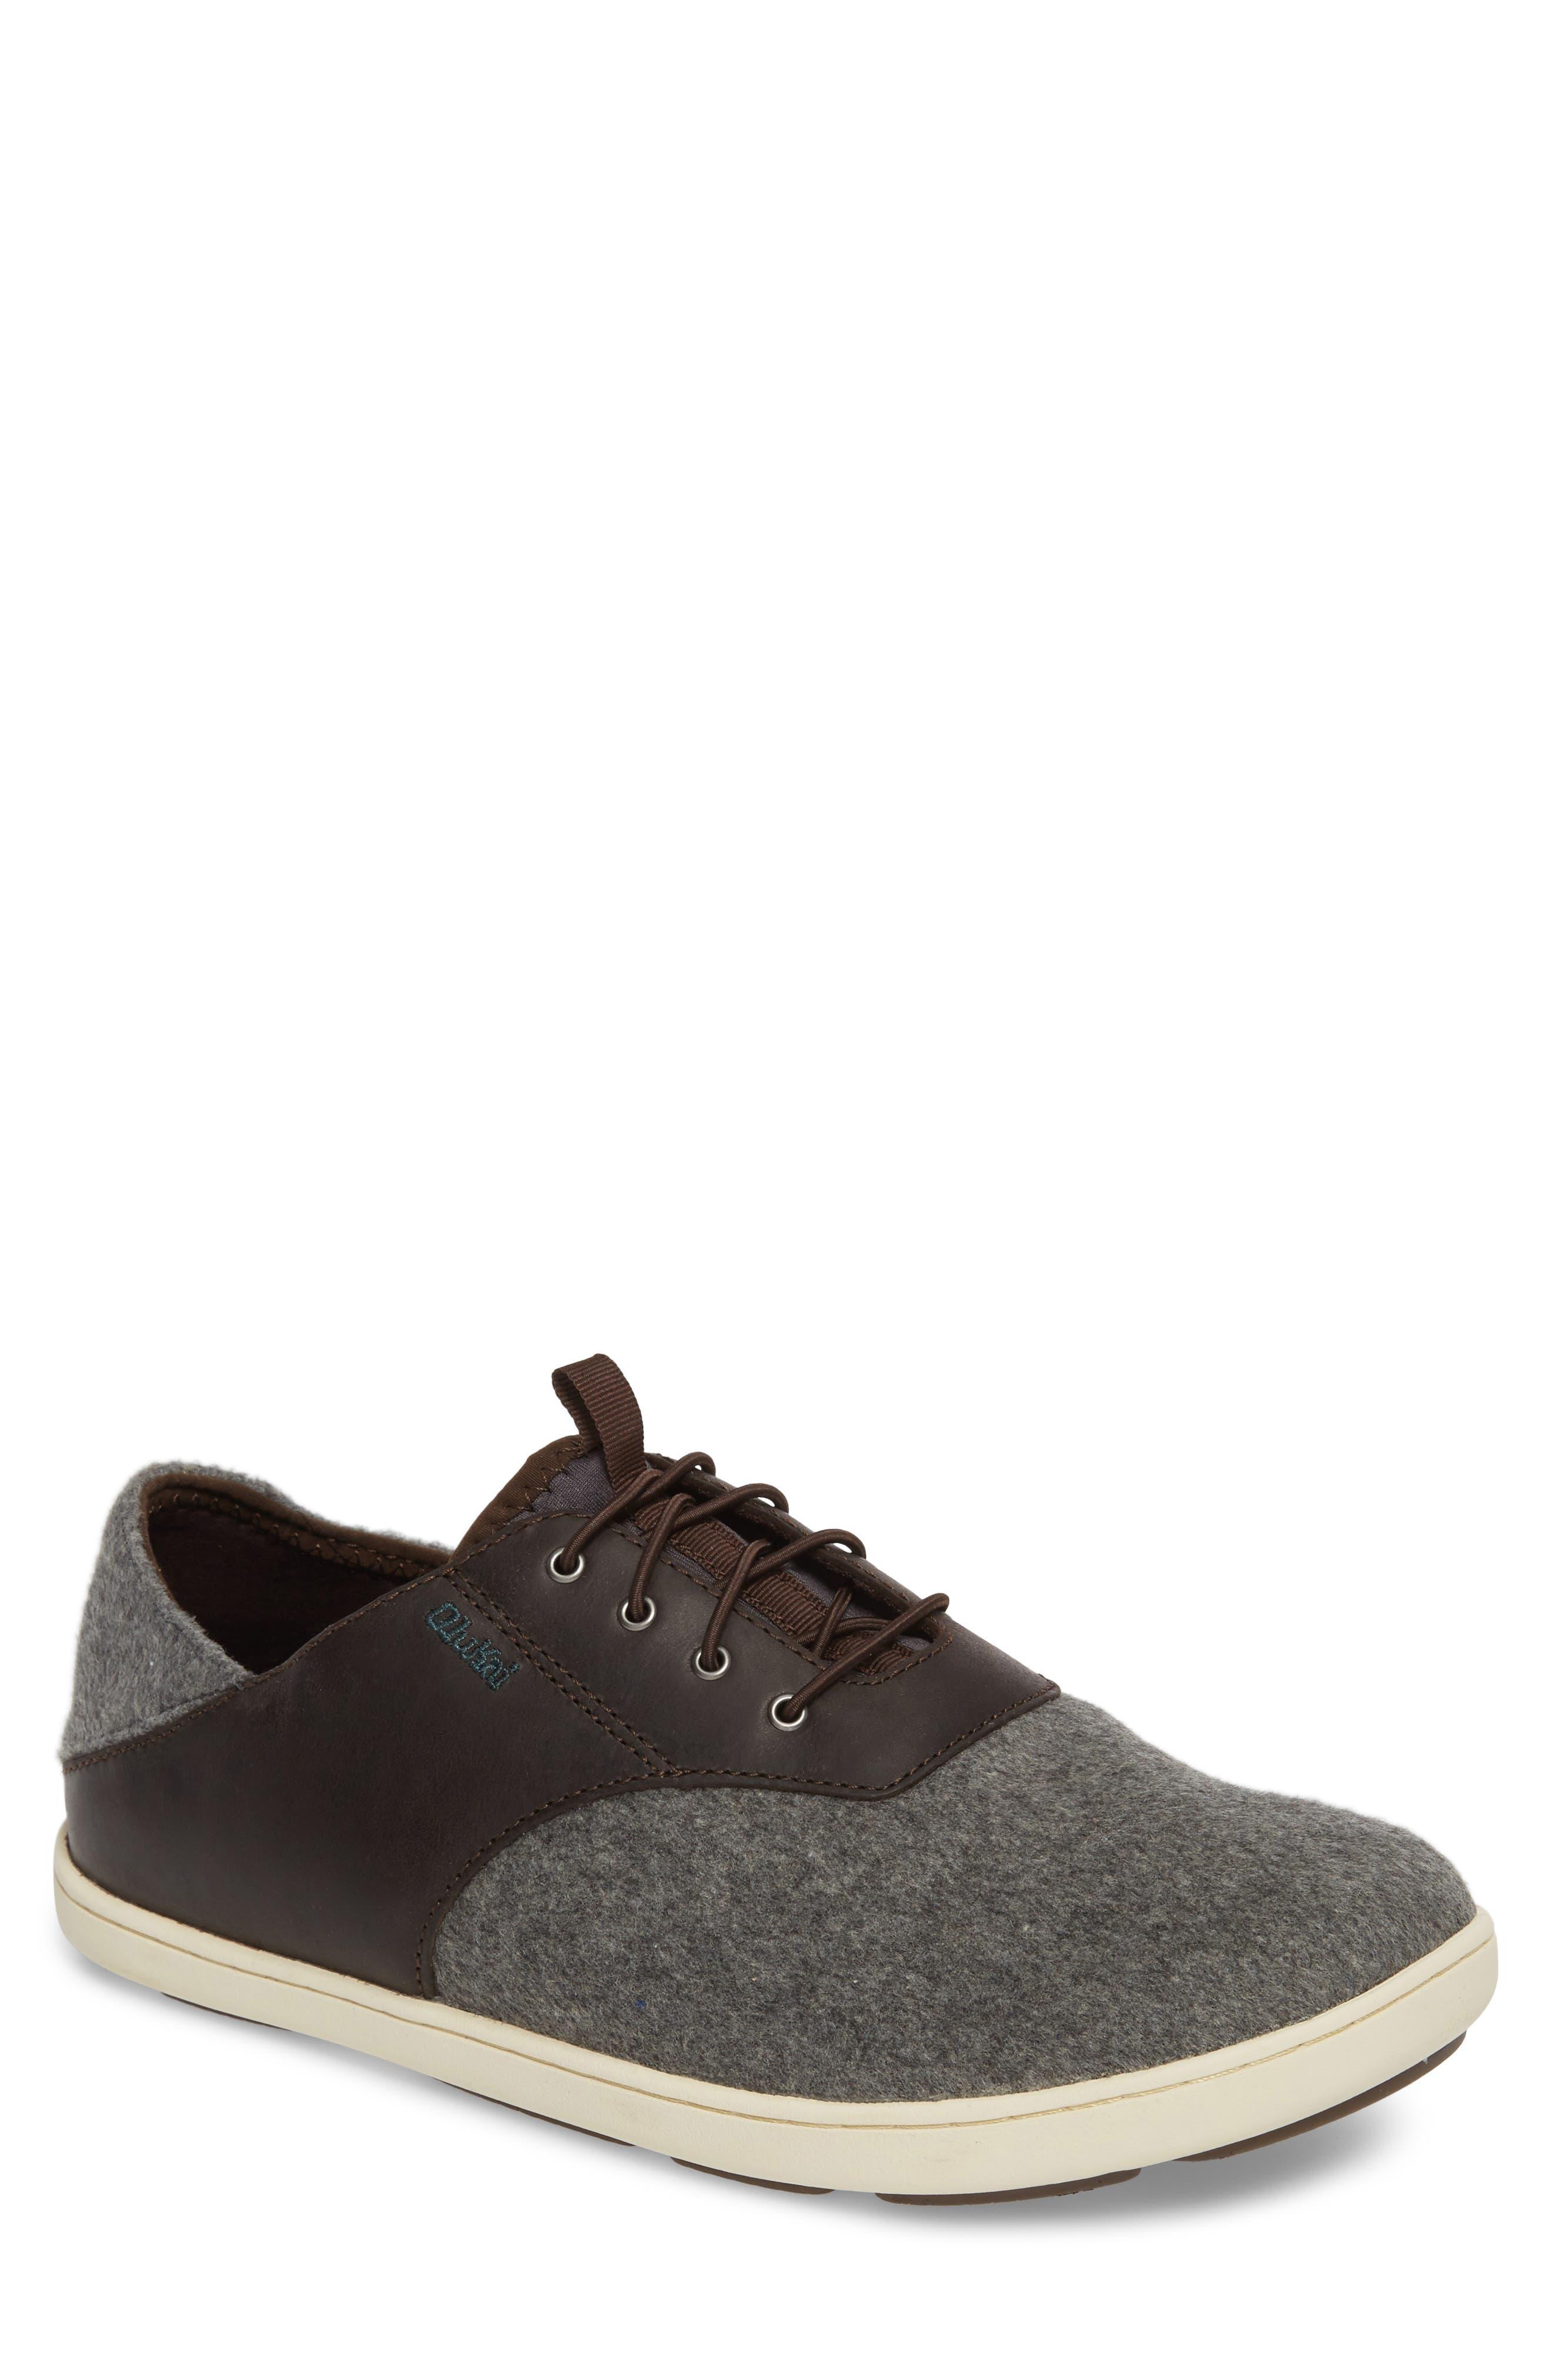 Nohea Moku Hulu Sneaker,                         Main,                         color, Dark Roast/ Charcoal Wool